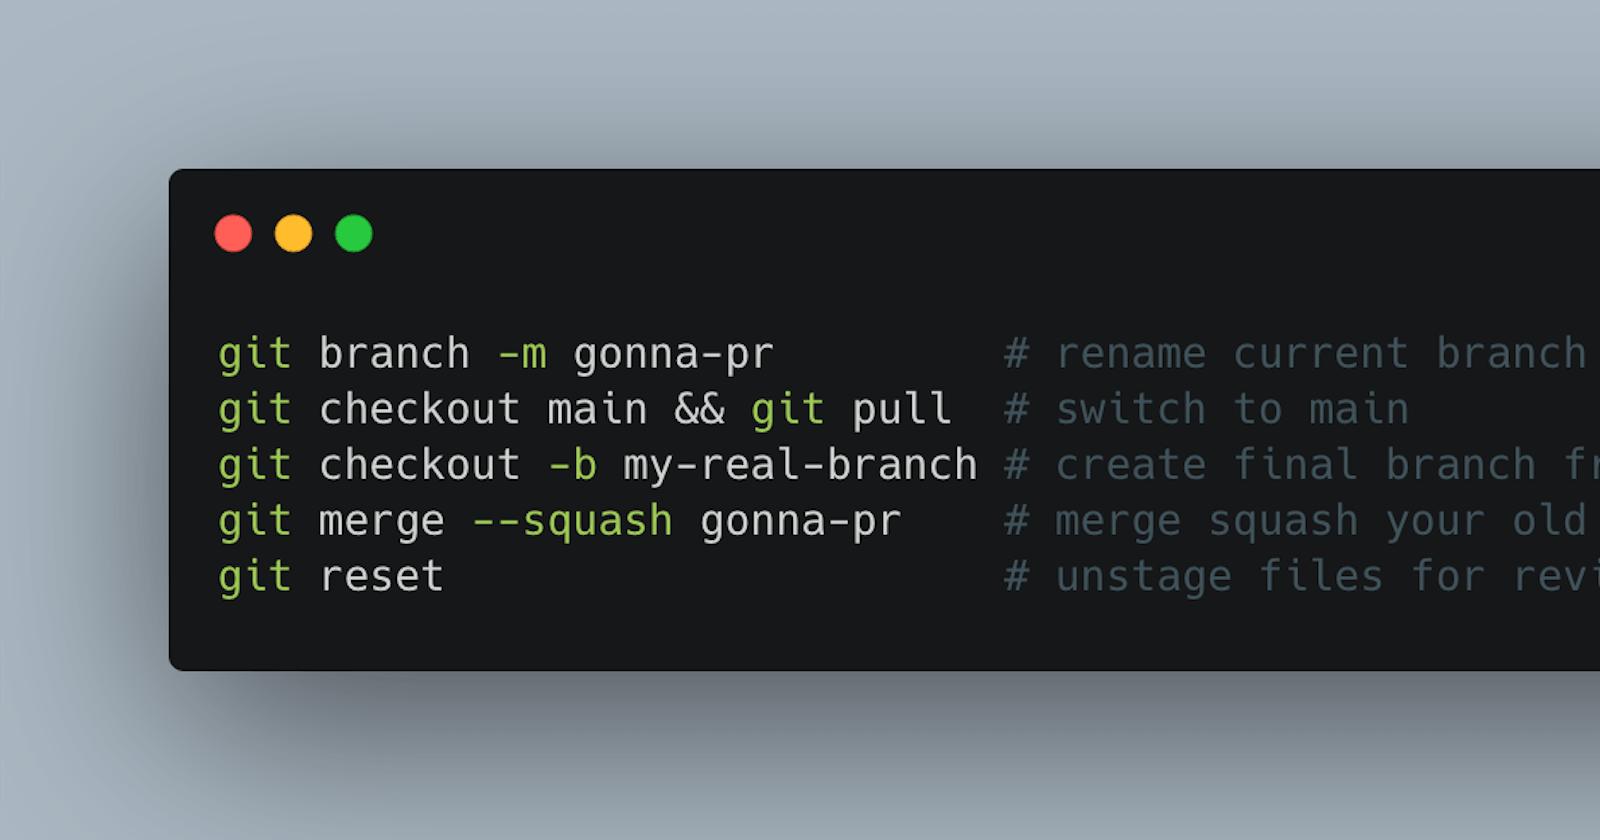 Make clean PRs with git merge --squash